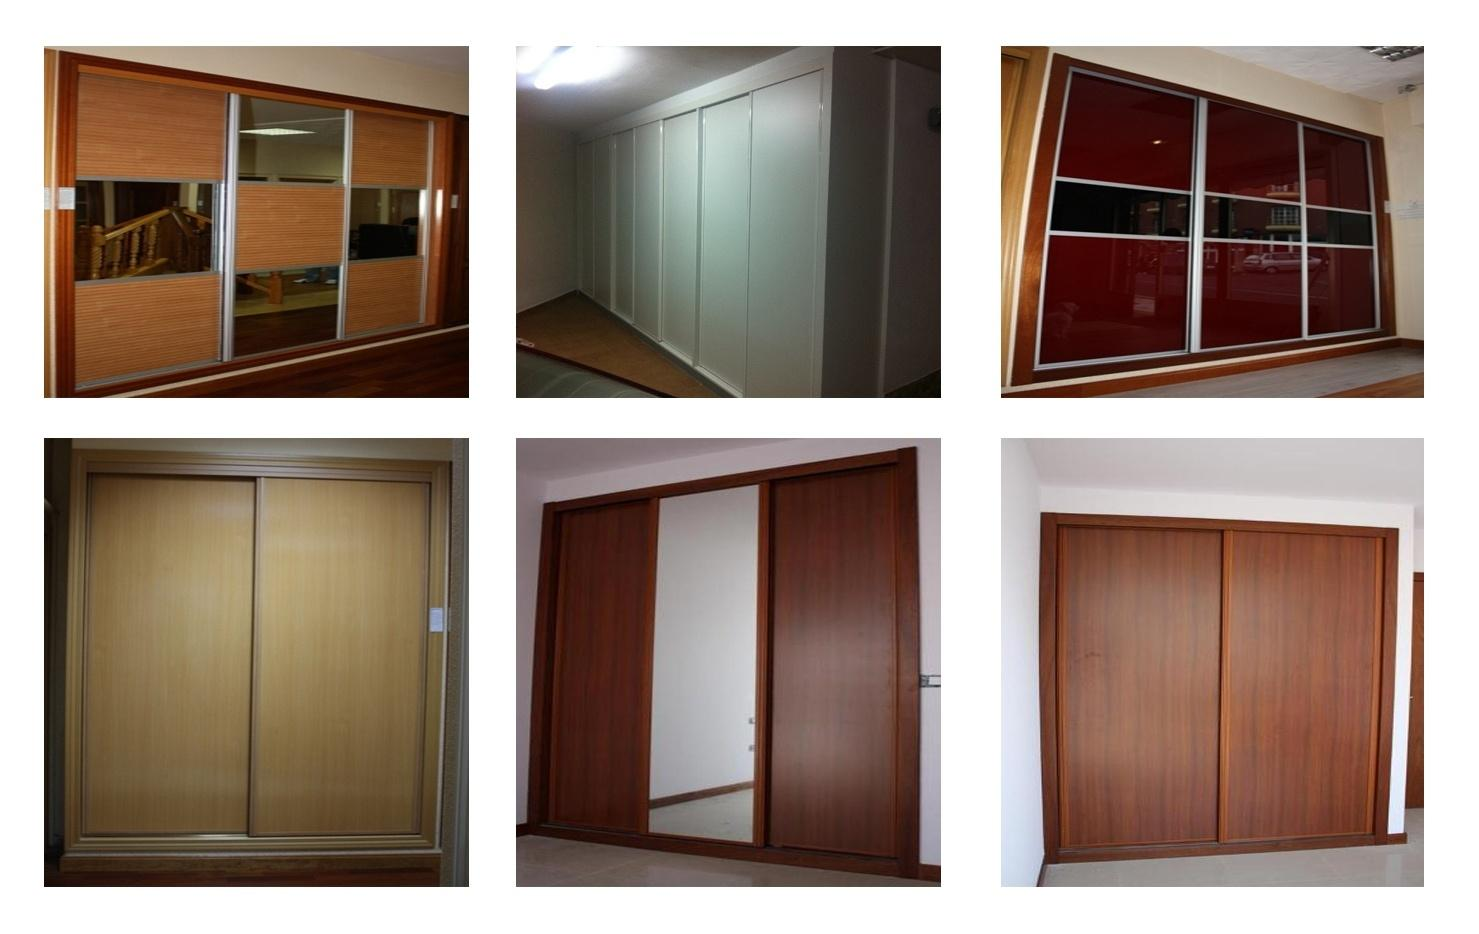 Armarios a medida tenerife affordable puertas a medida - Armarios a medida tenerife ...